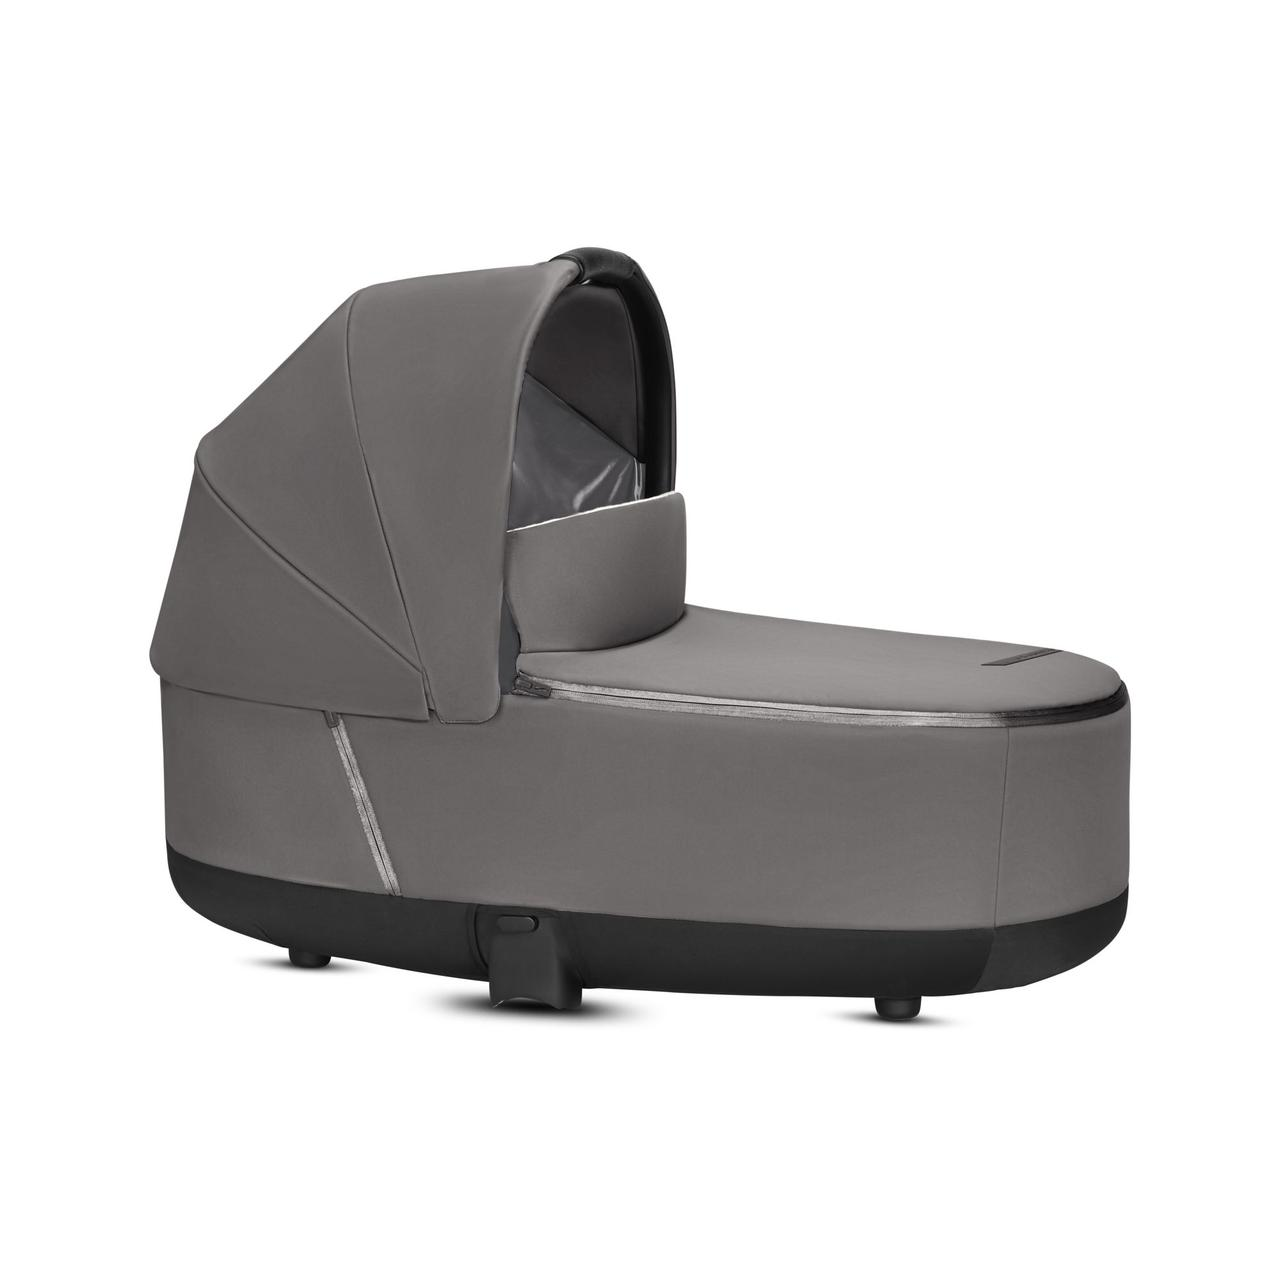 Cybex - Люлька Priam Lux, цвет Manhattan Grey